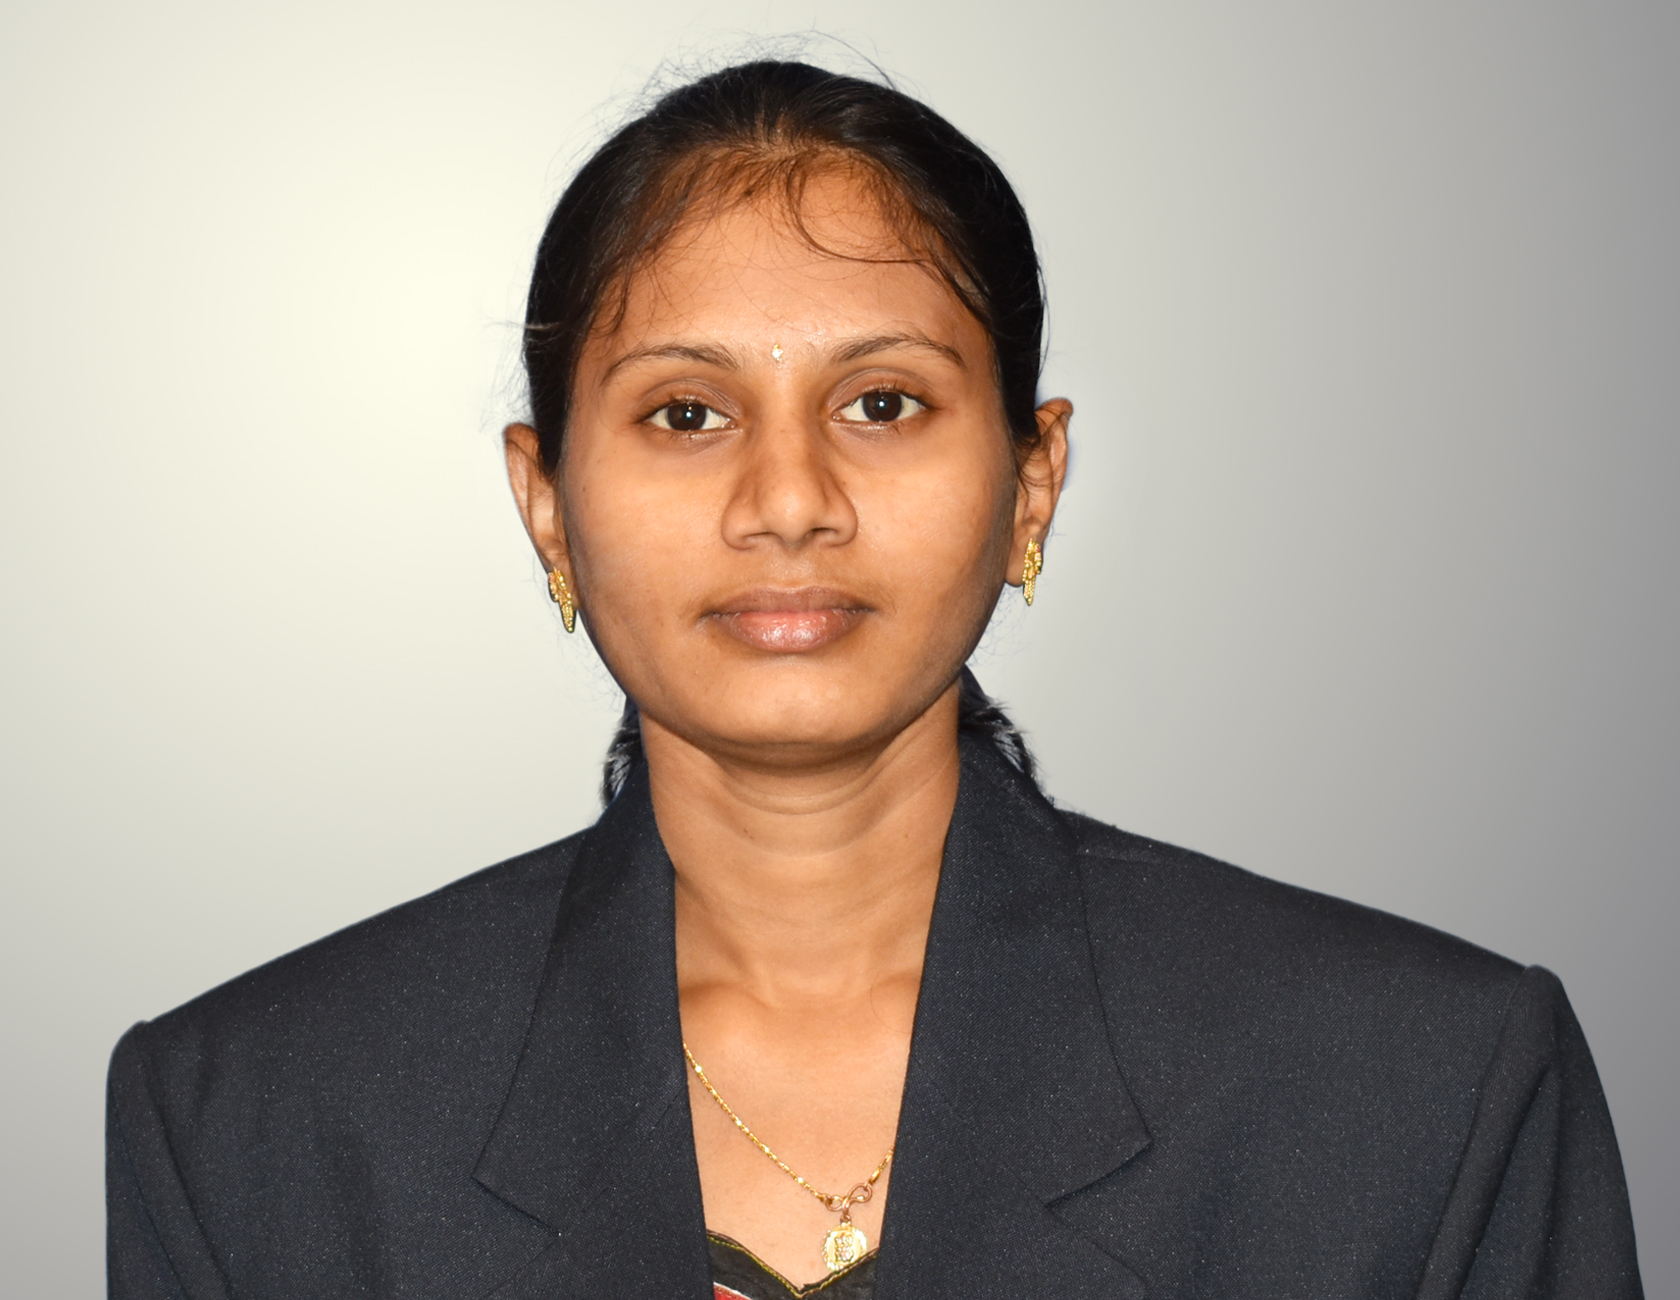 Asha Jyothi Mullaguri